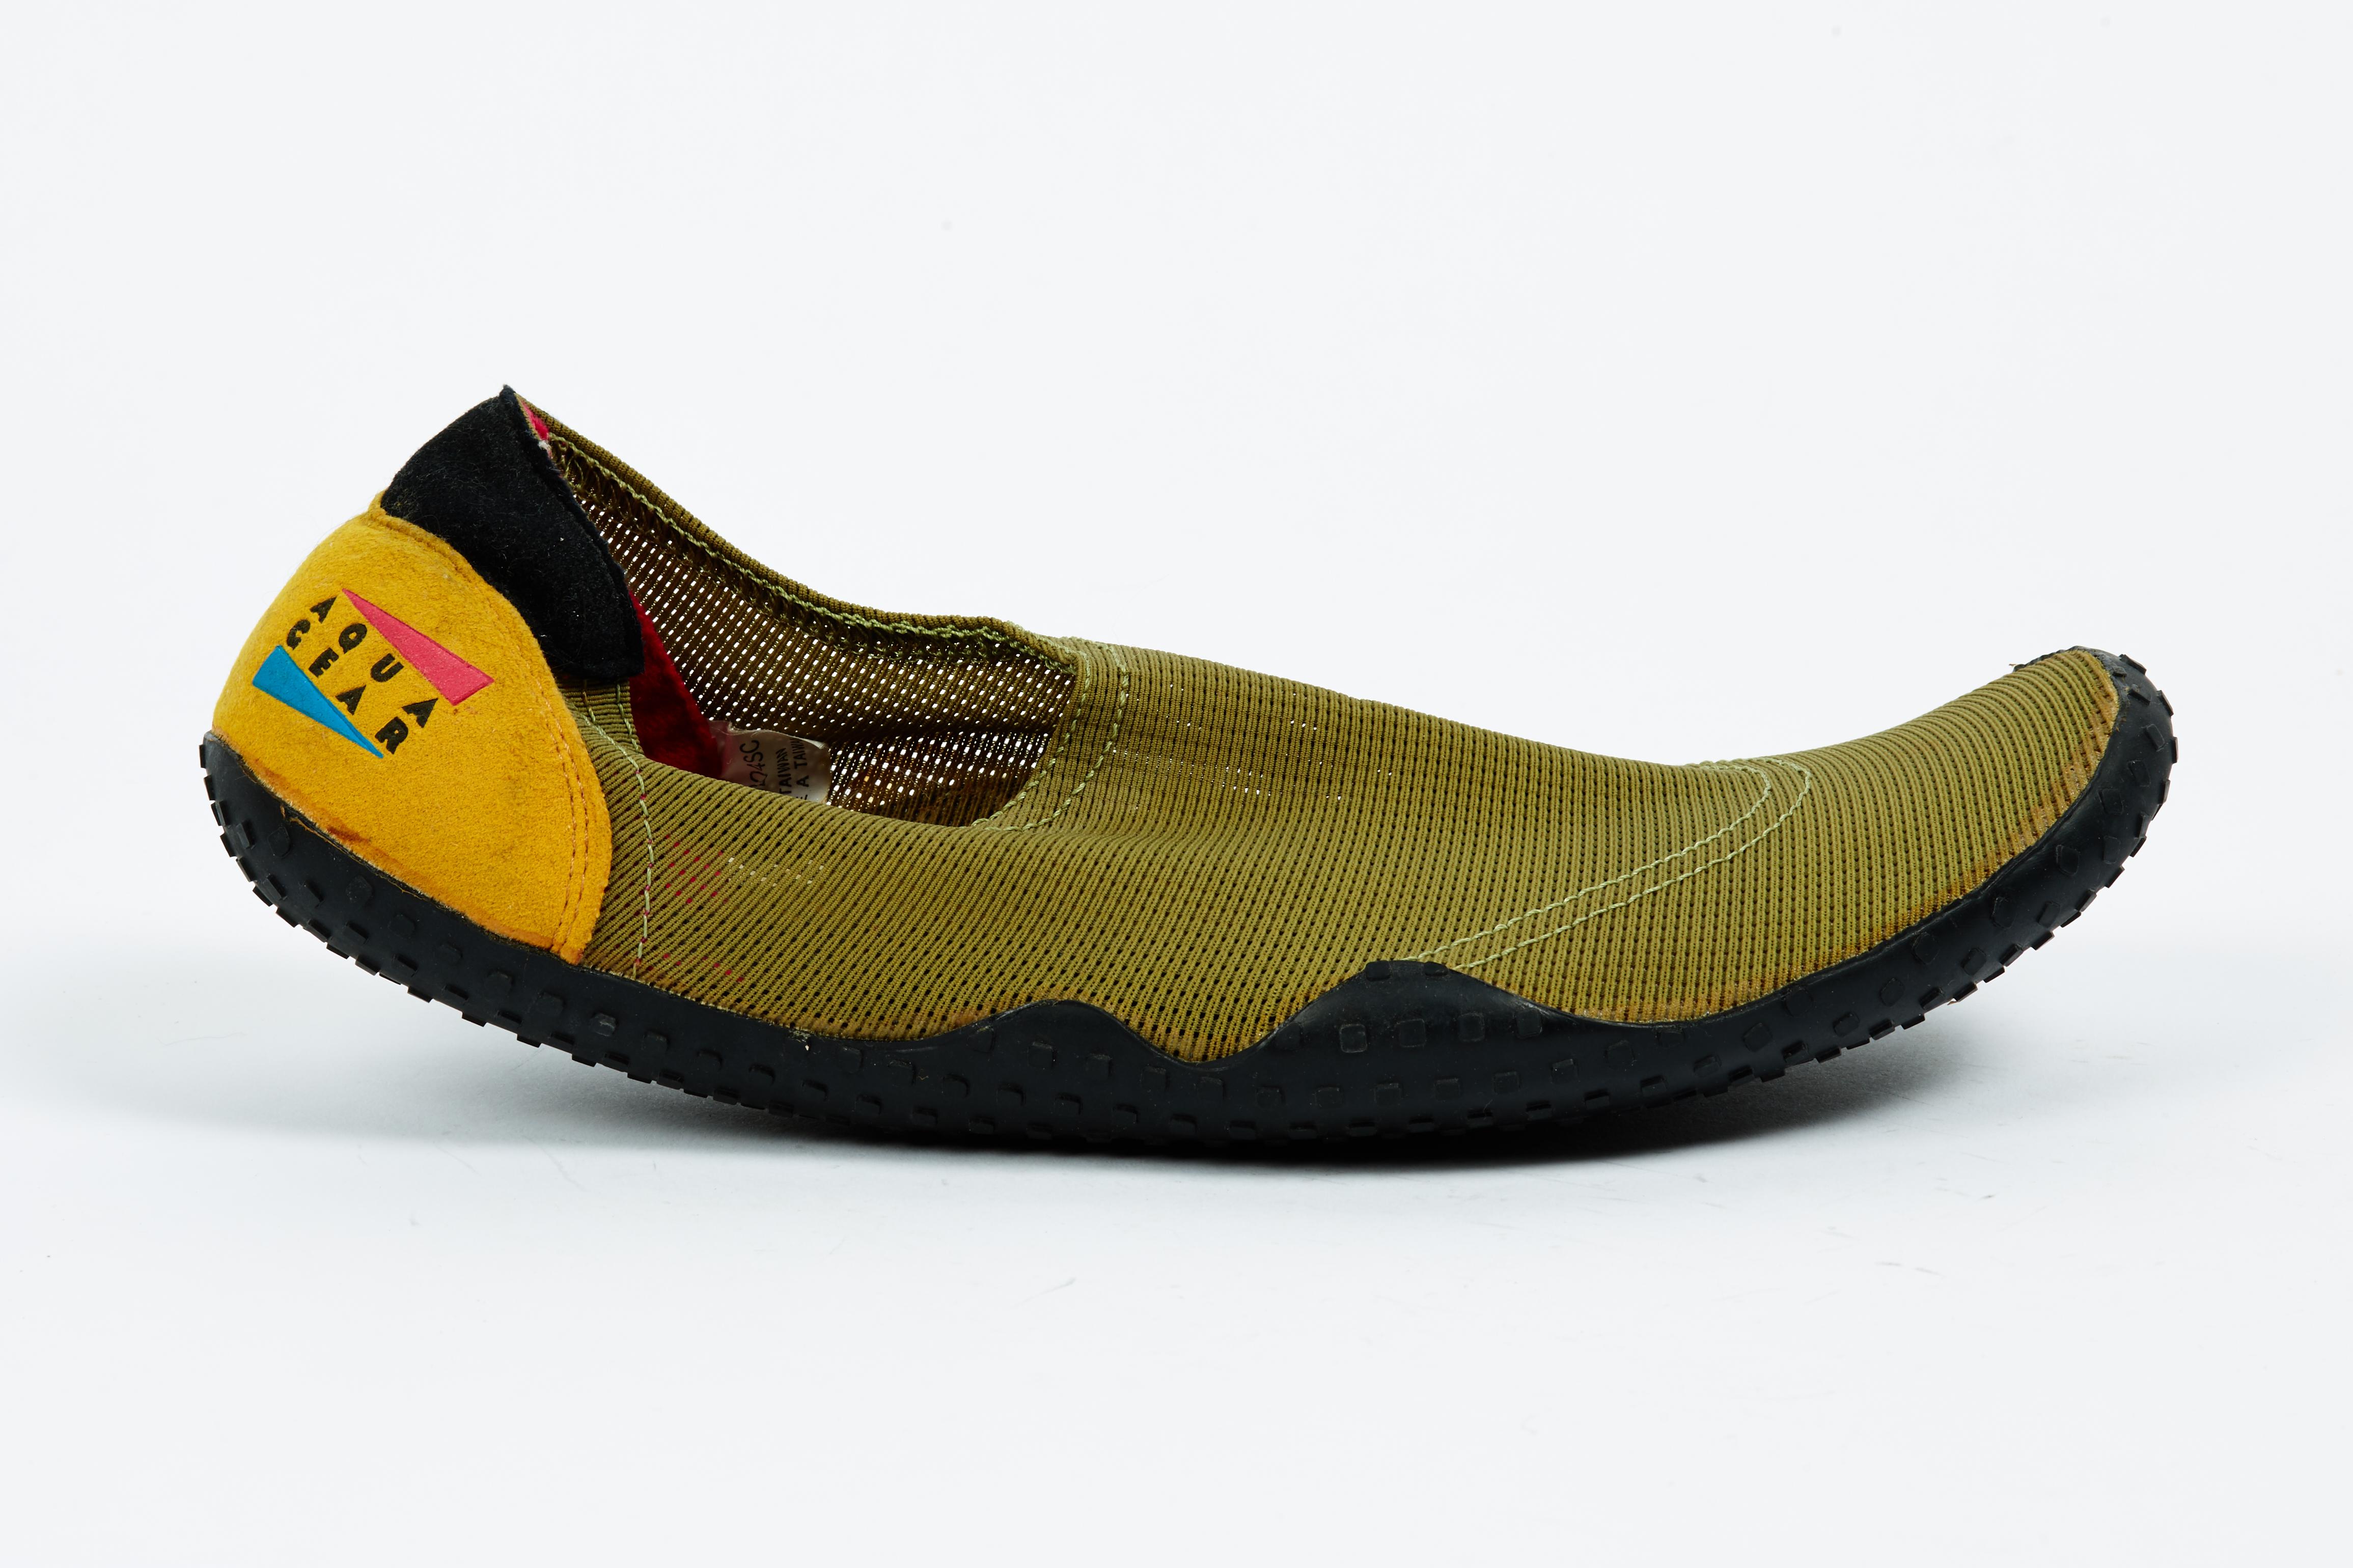 Vintage Nike ACG Boots, Women's Size 10